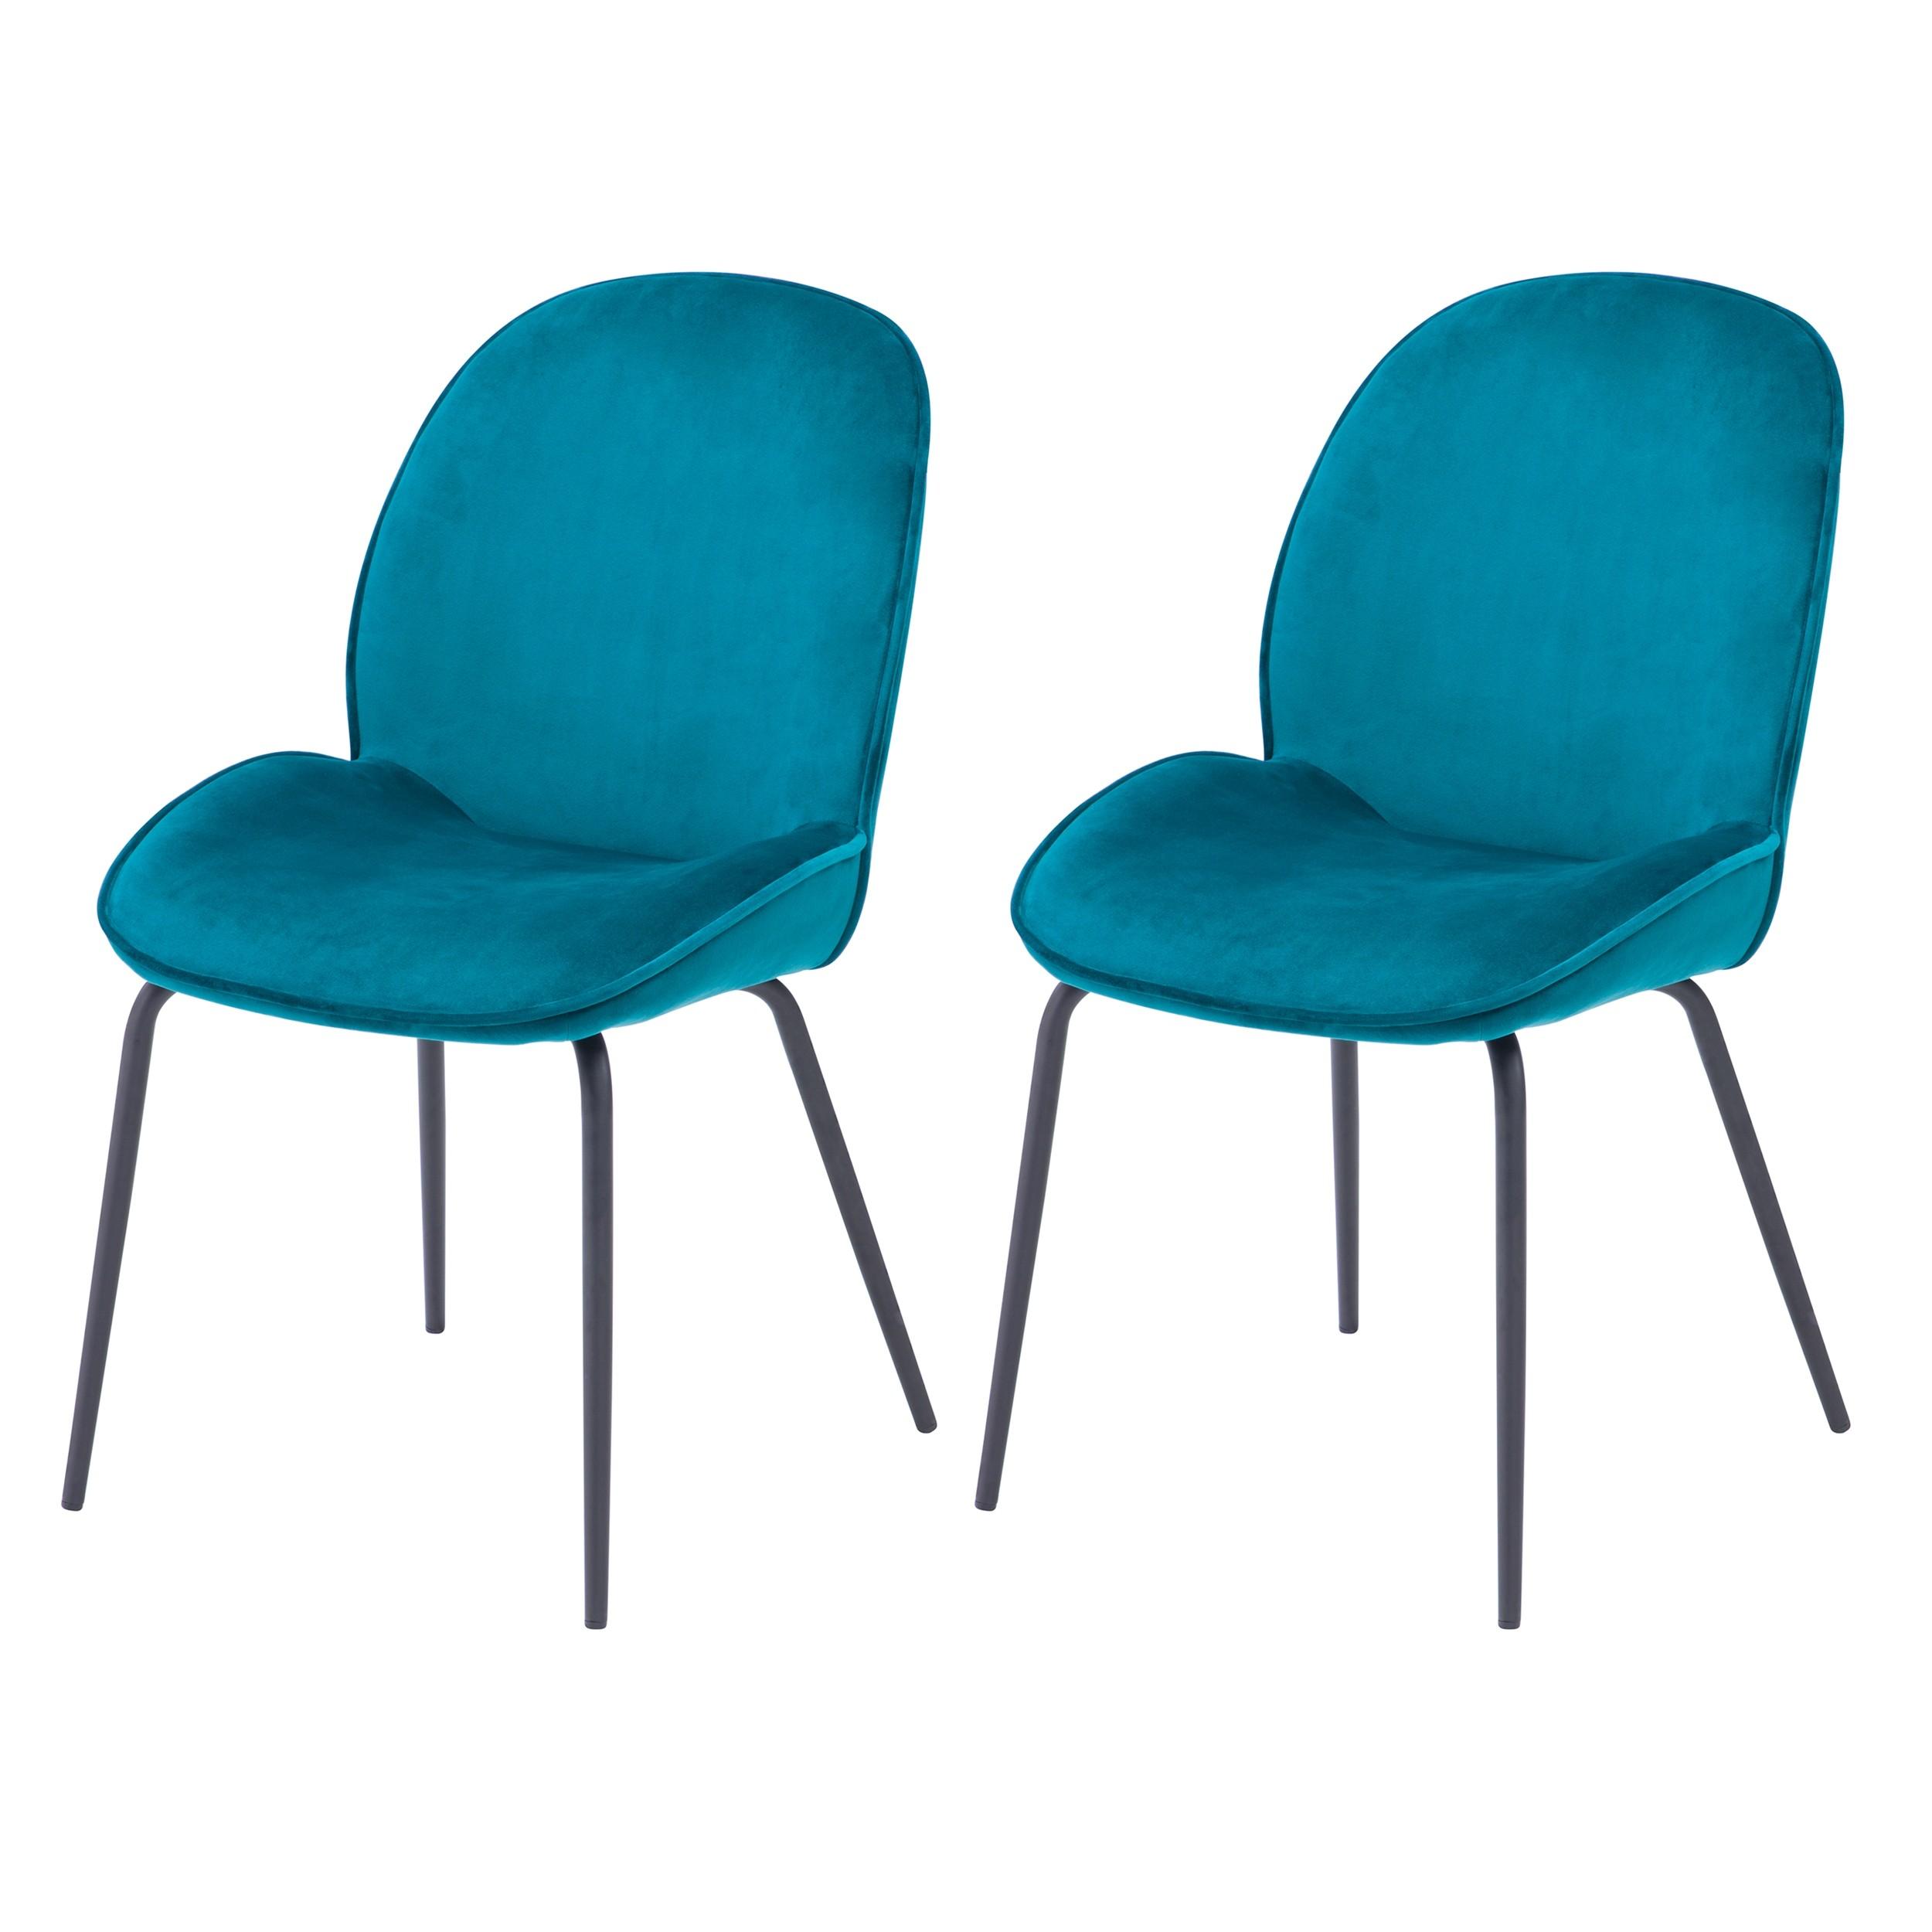 acheter chaise en velours lot de 2 bleu